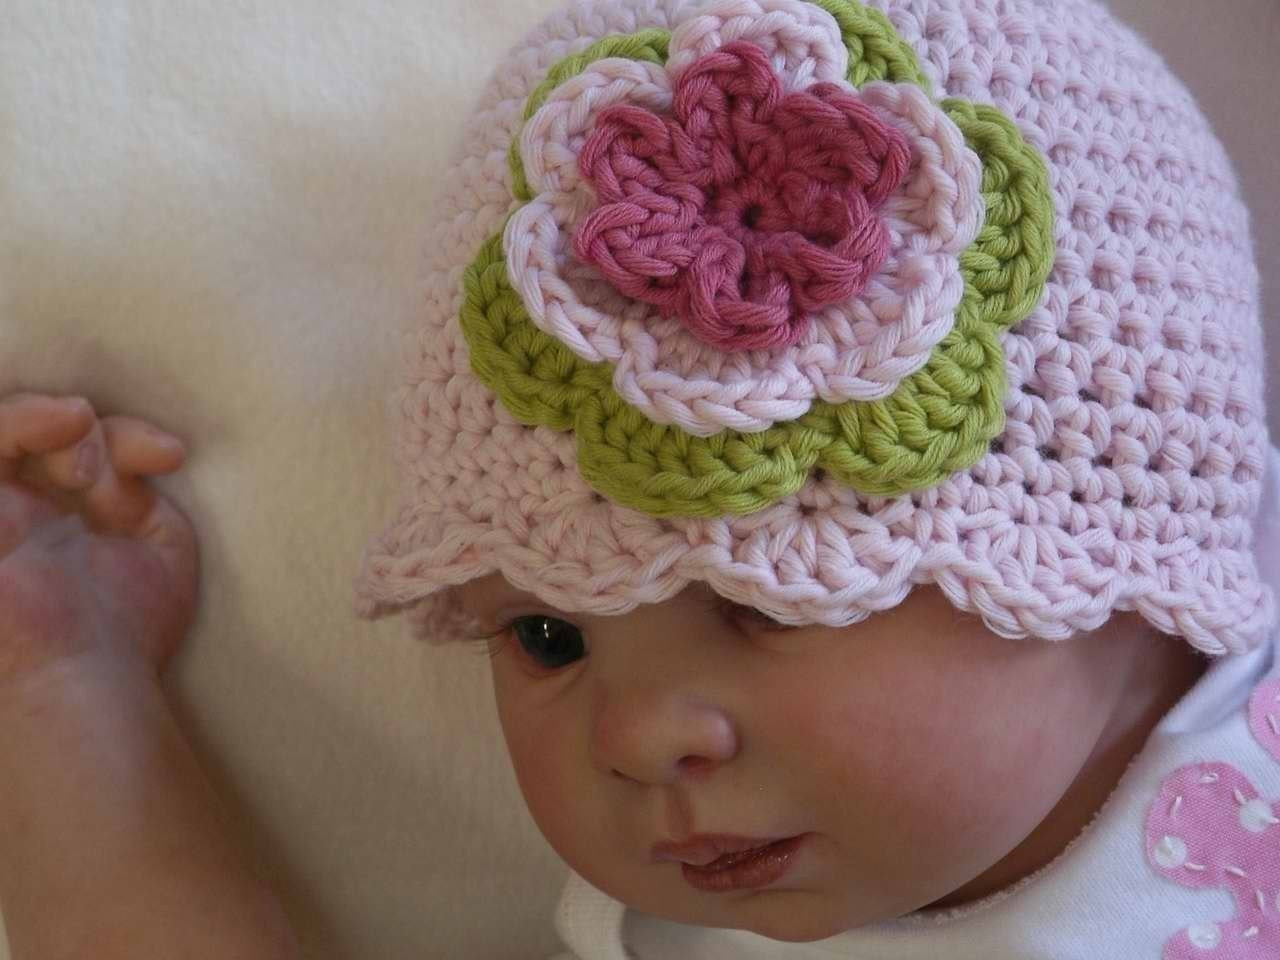 Easy Peasy Crochet Hat Patterns : Crochet Hat Pattern Easy Peasy Shell Trim Baby by ...